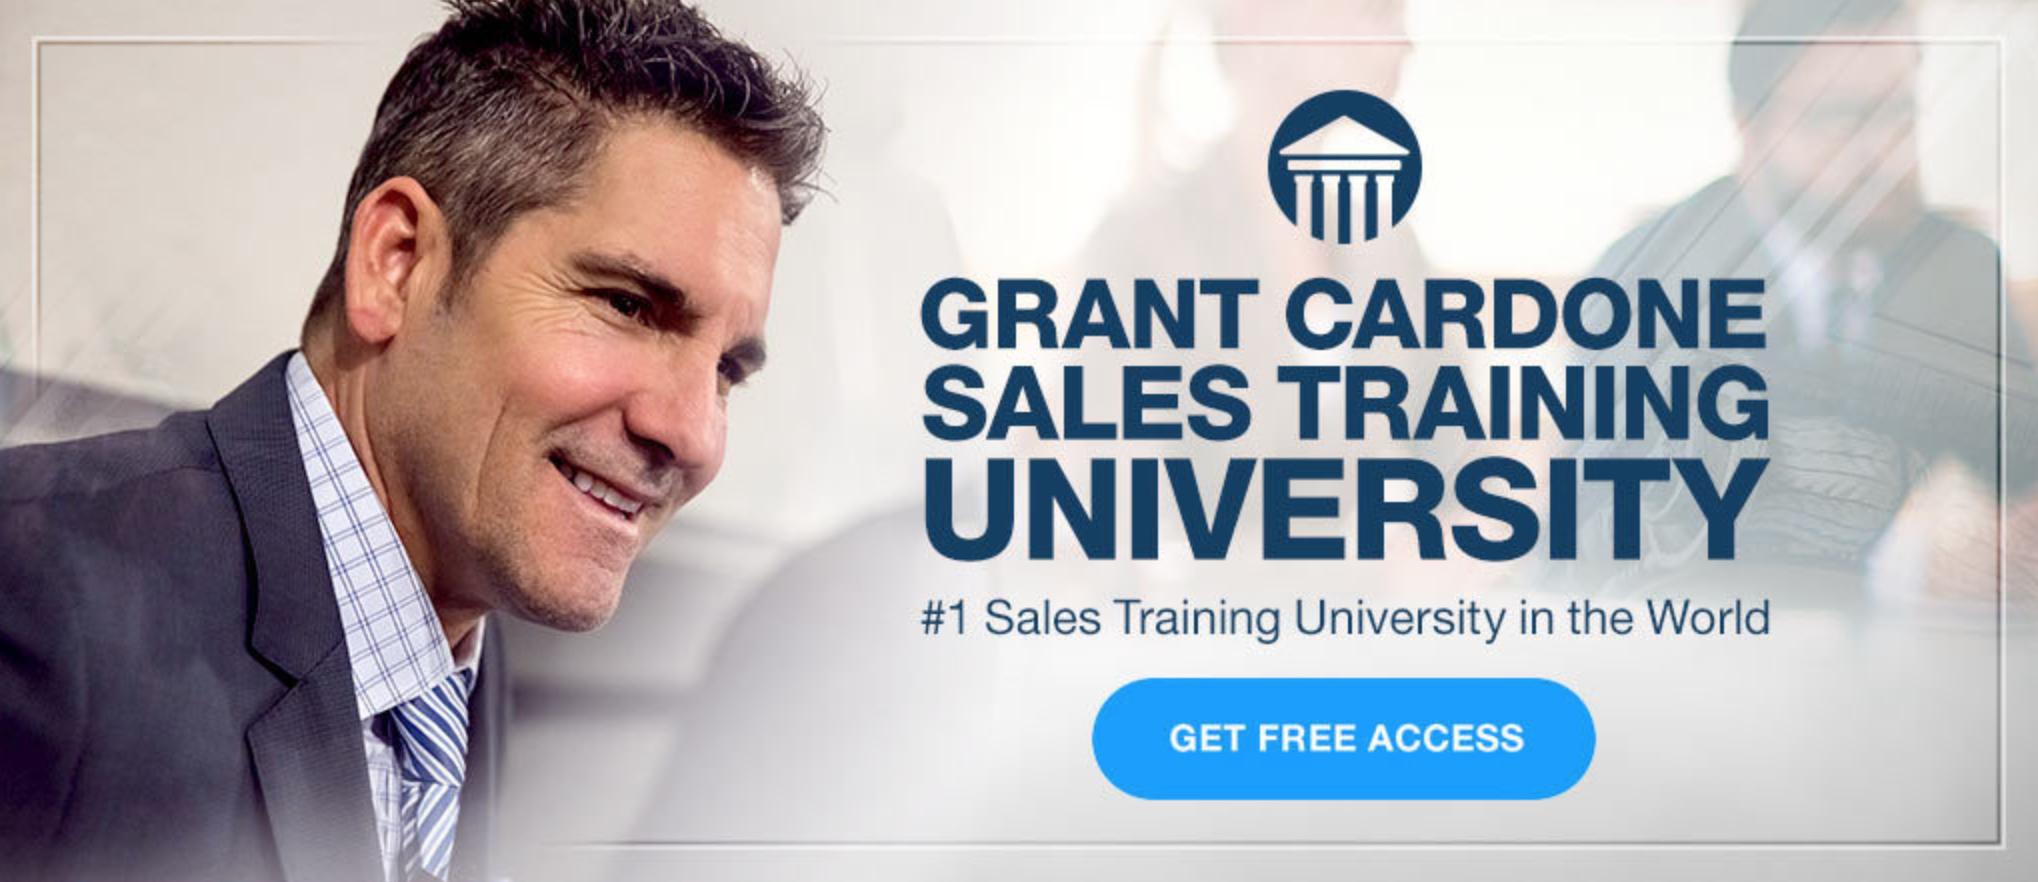 Cardone University Free Access